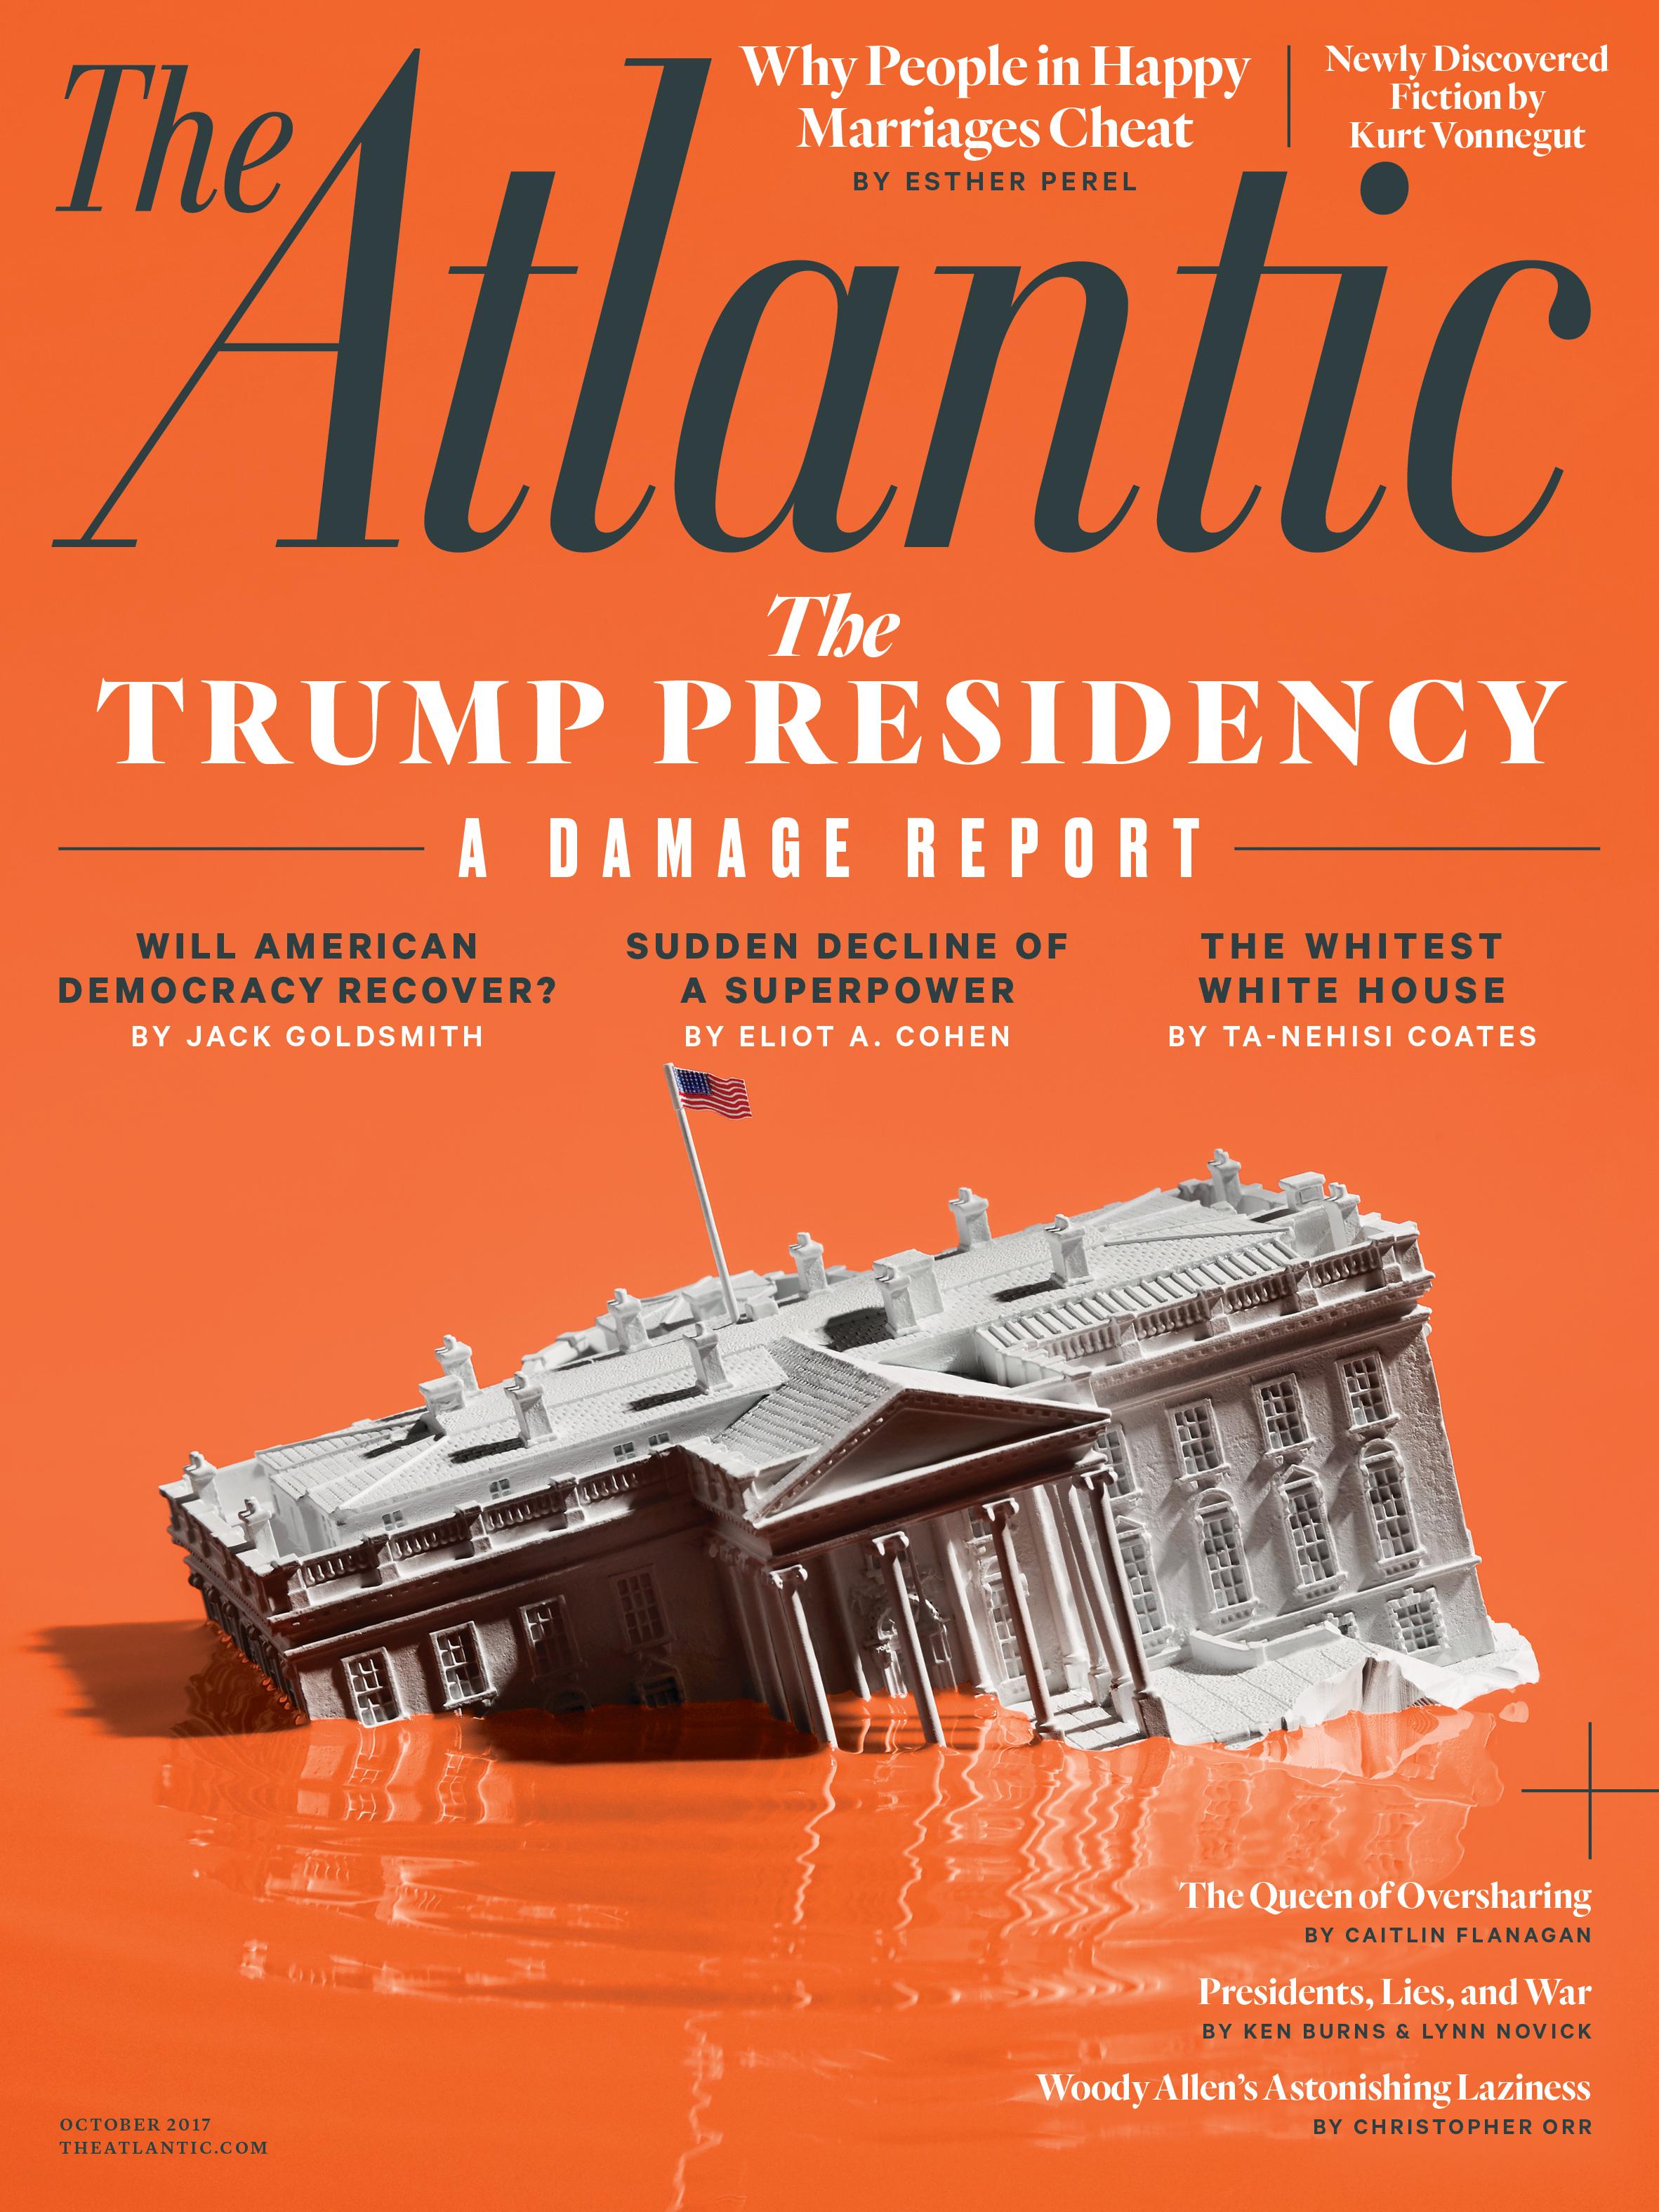 Will Donald Trump Destroy the Presidency? - The Atlantic